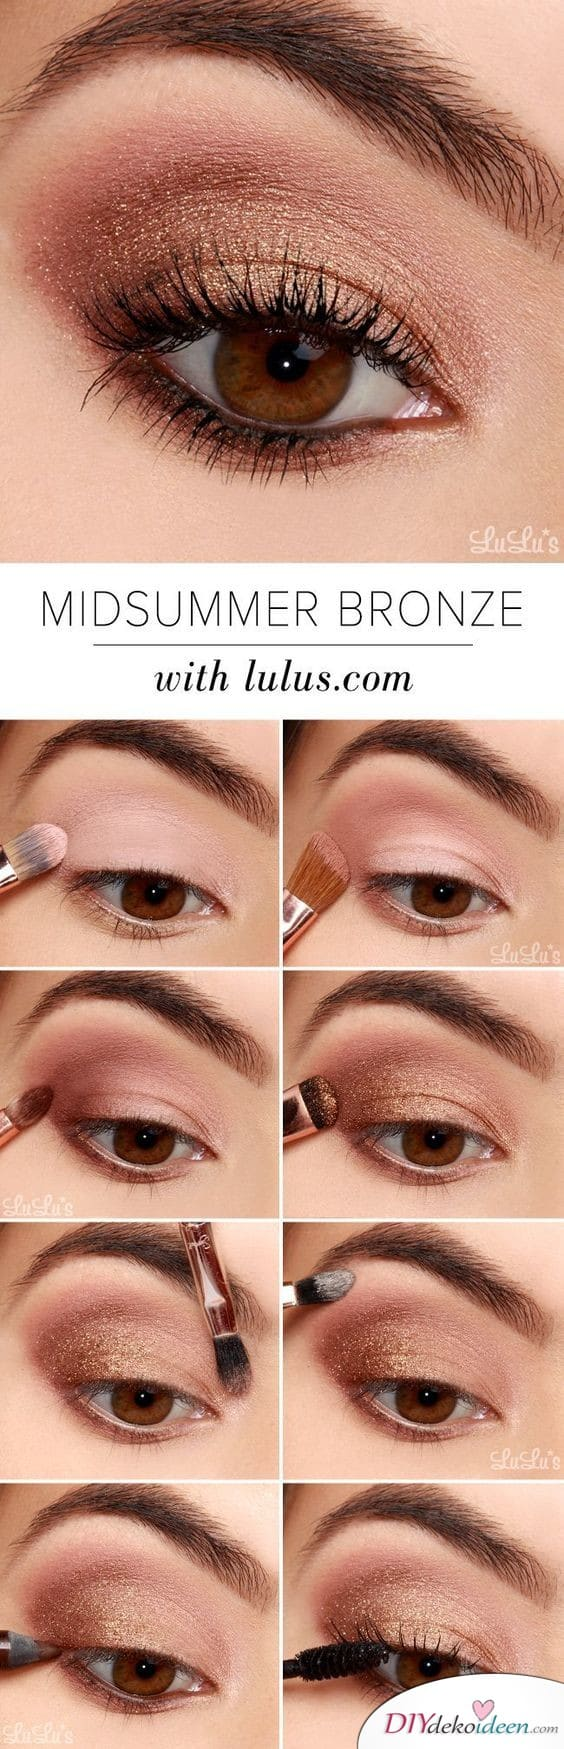 Mittsommer Augen-Make-up